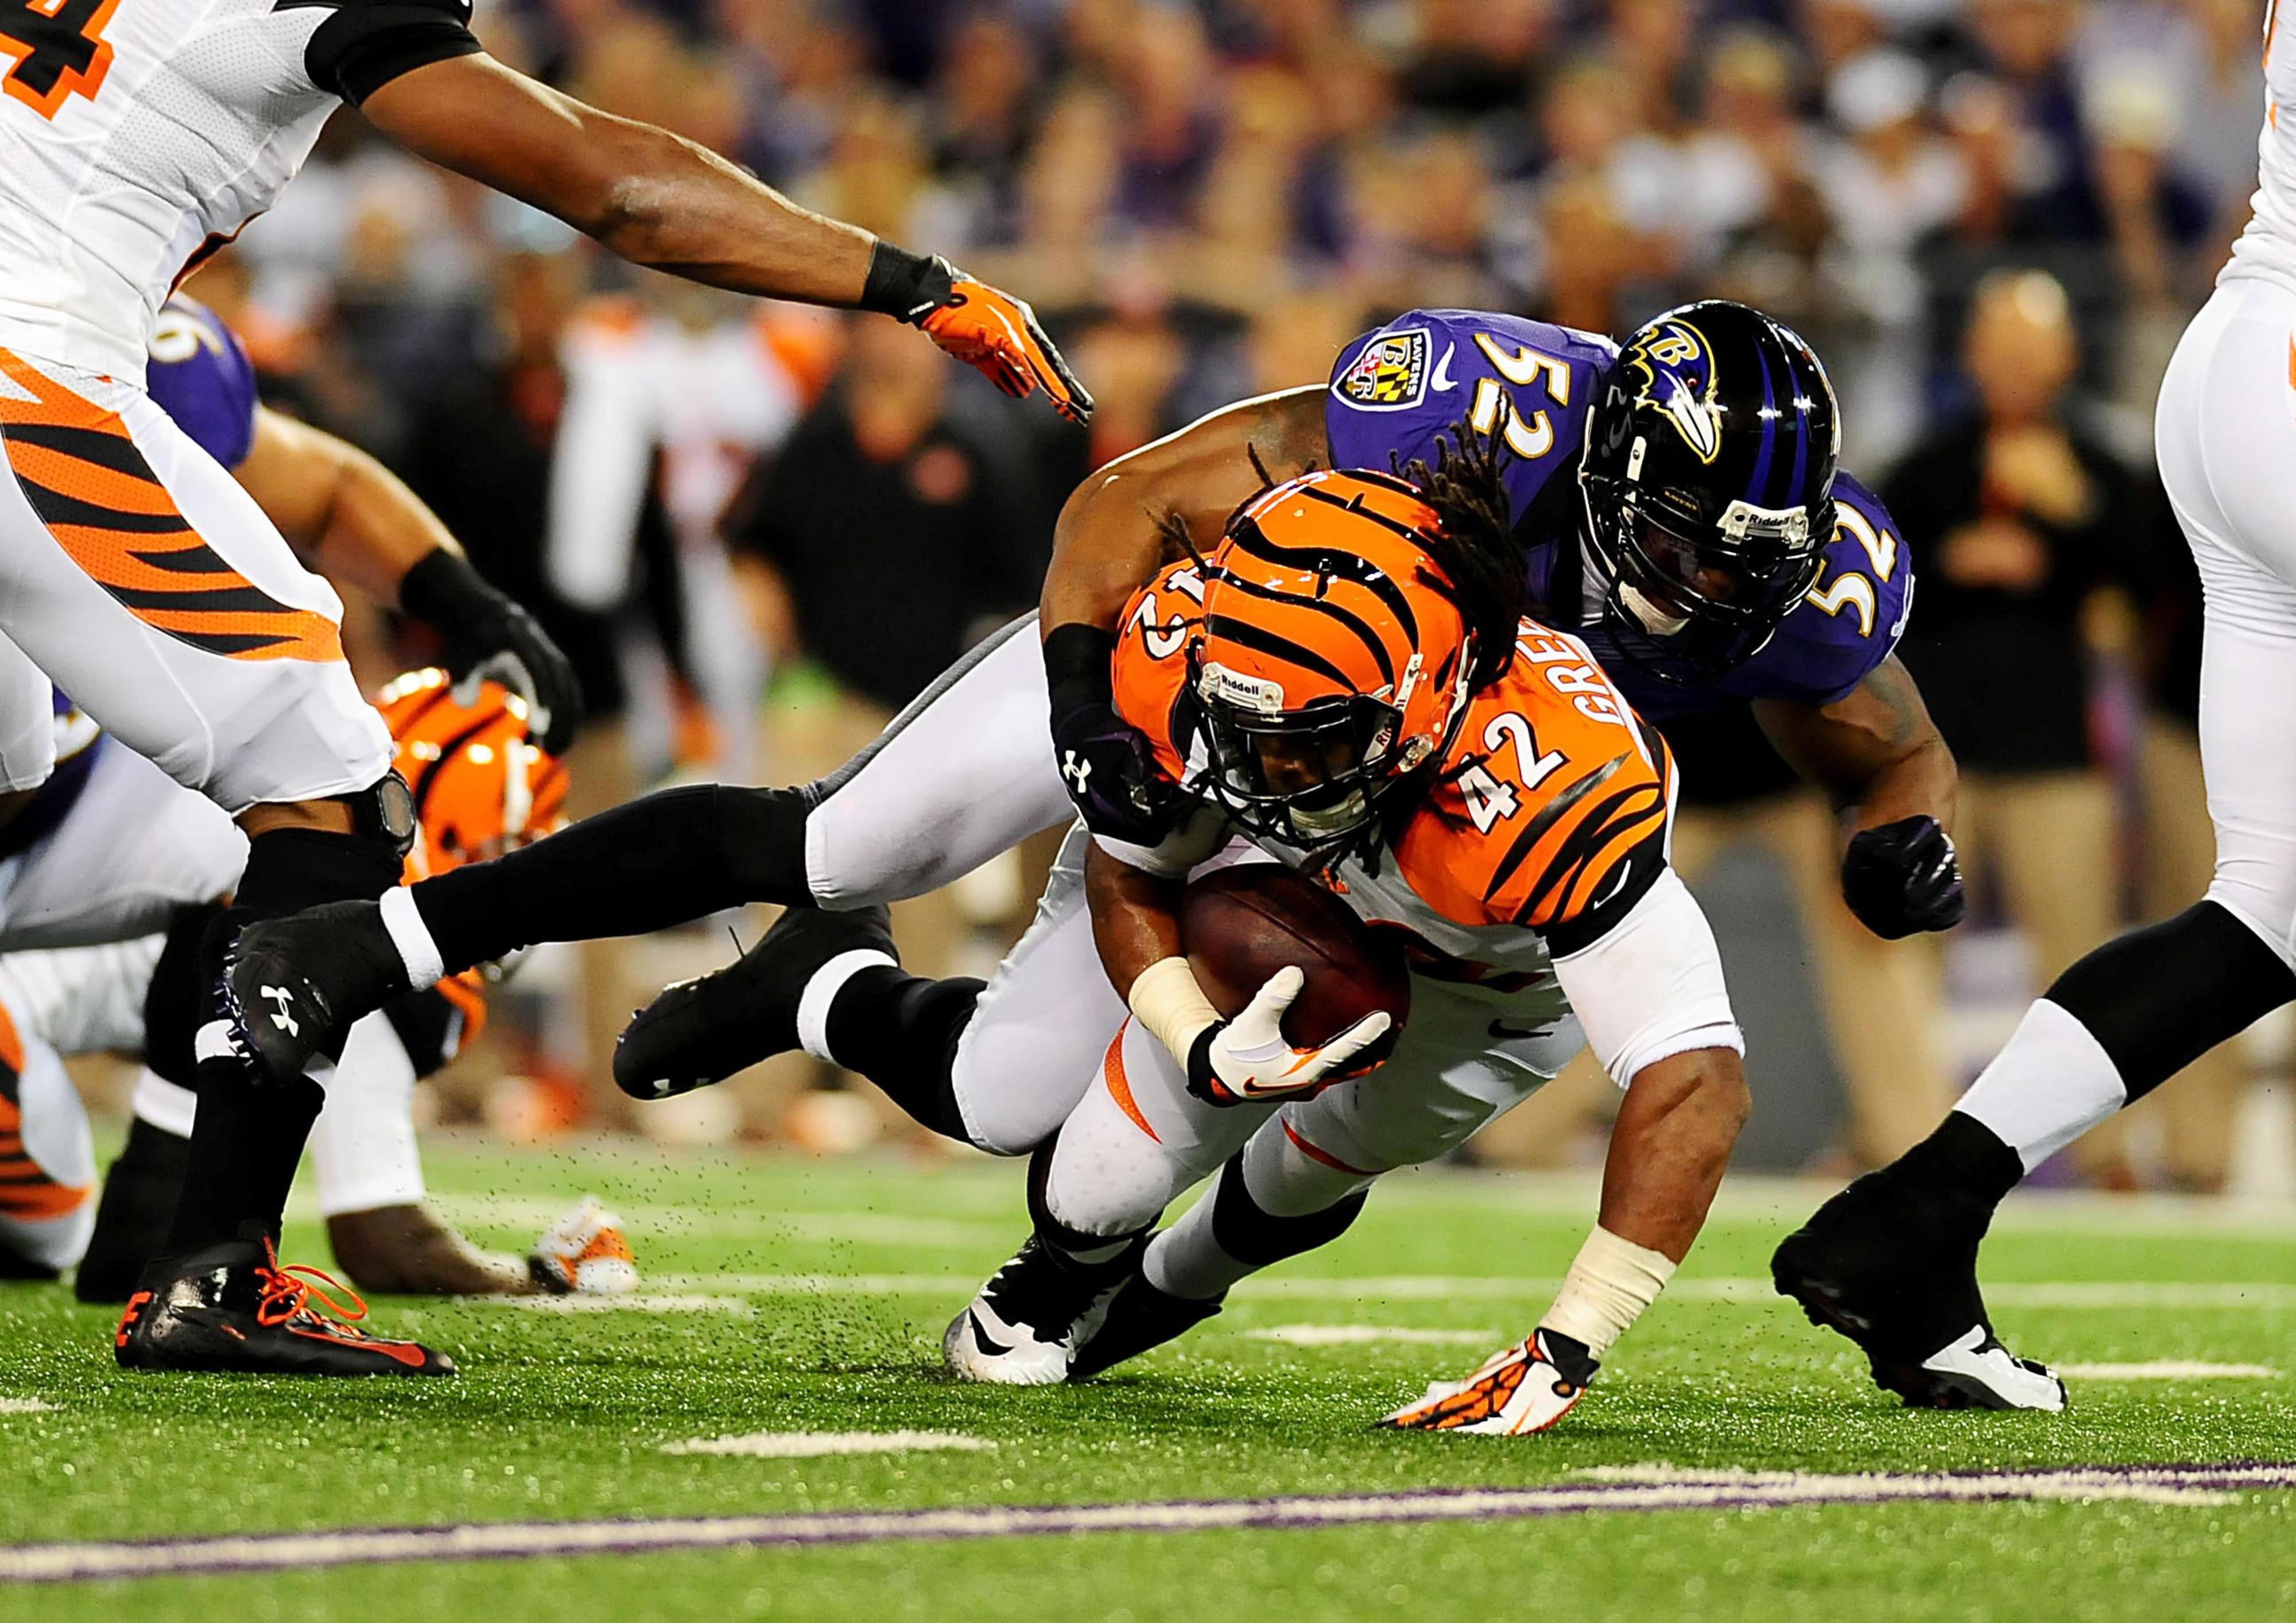 September 10, 2012; Baltimore, MD, USA; Cincinnati Bengals running back BenJarvus Green-Ellis (42) gets tackled by Baltimore Ravens linebacker Ray Lewis (52) at M&T Bank Stadium. Mandatory Credit: Evan Habeeb-US PRESSWIRE